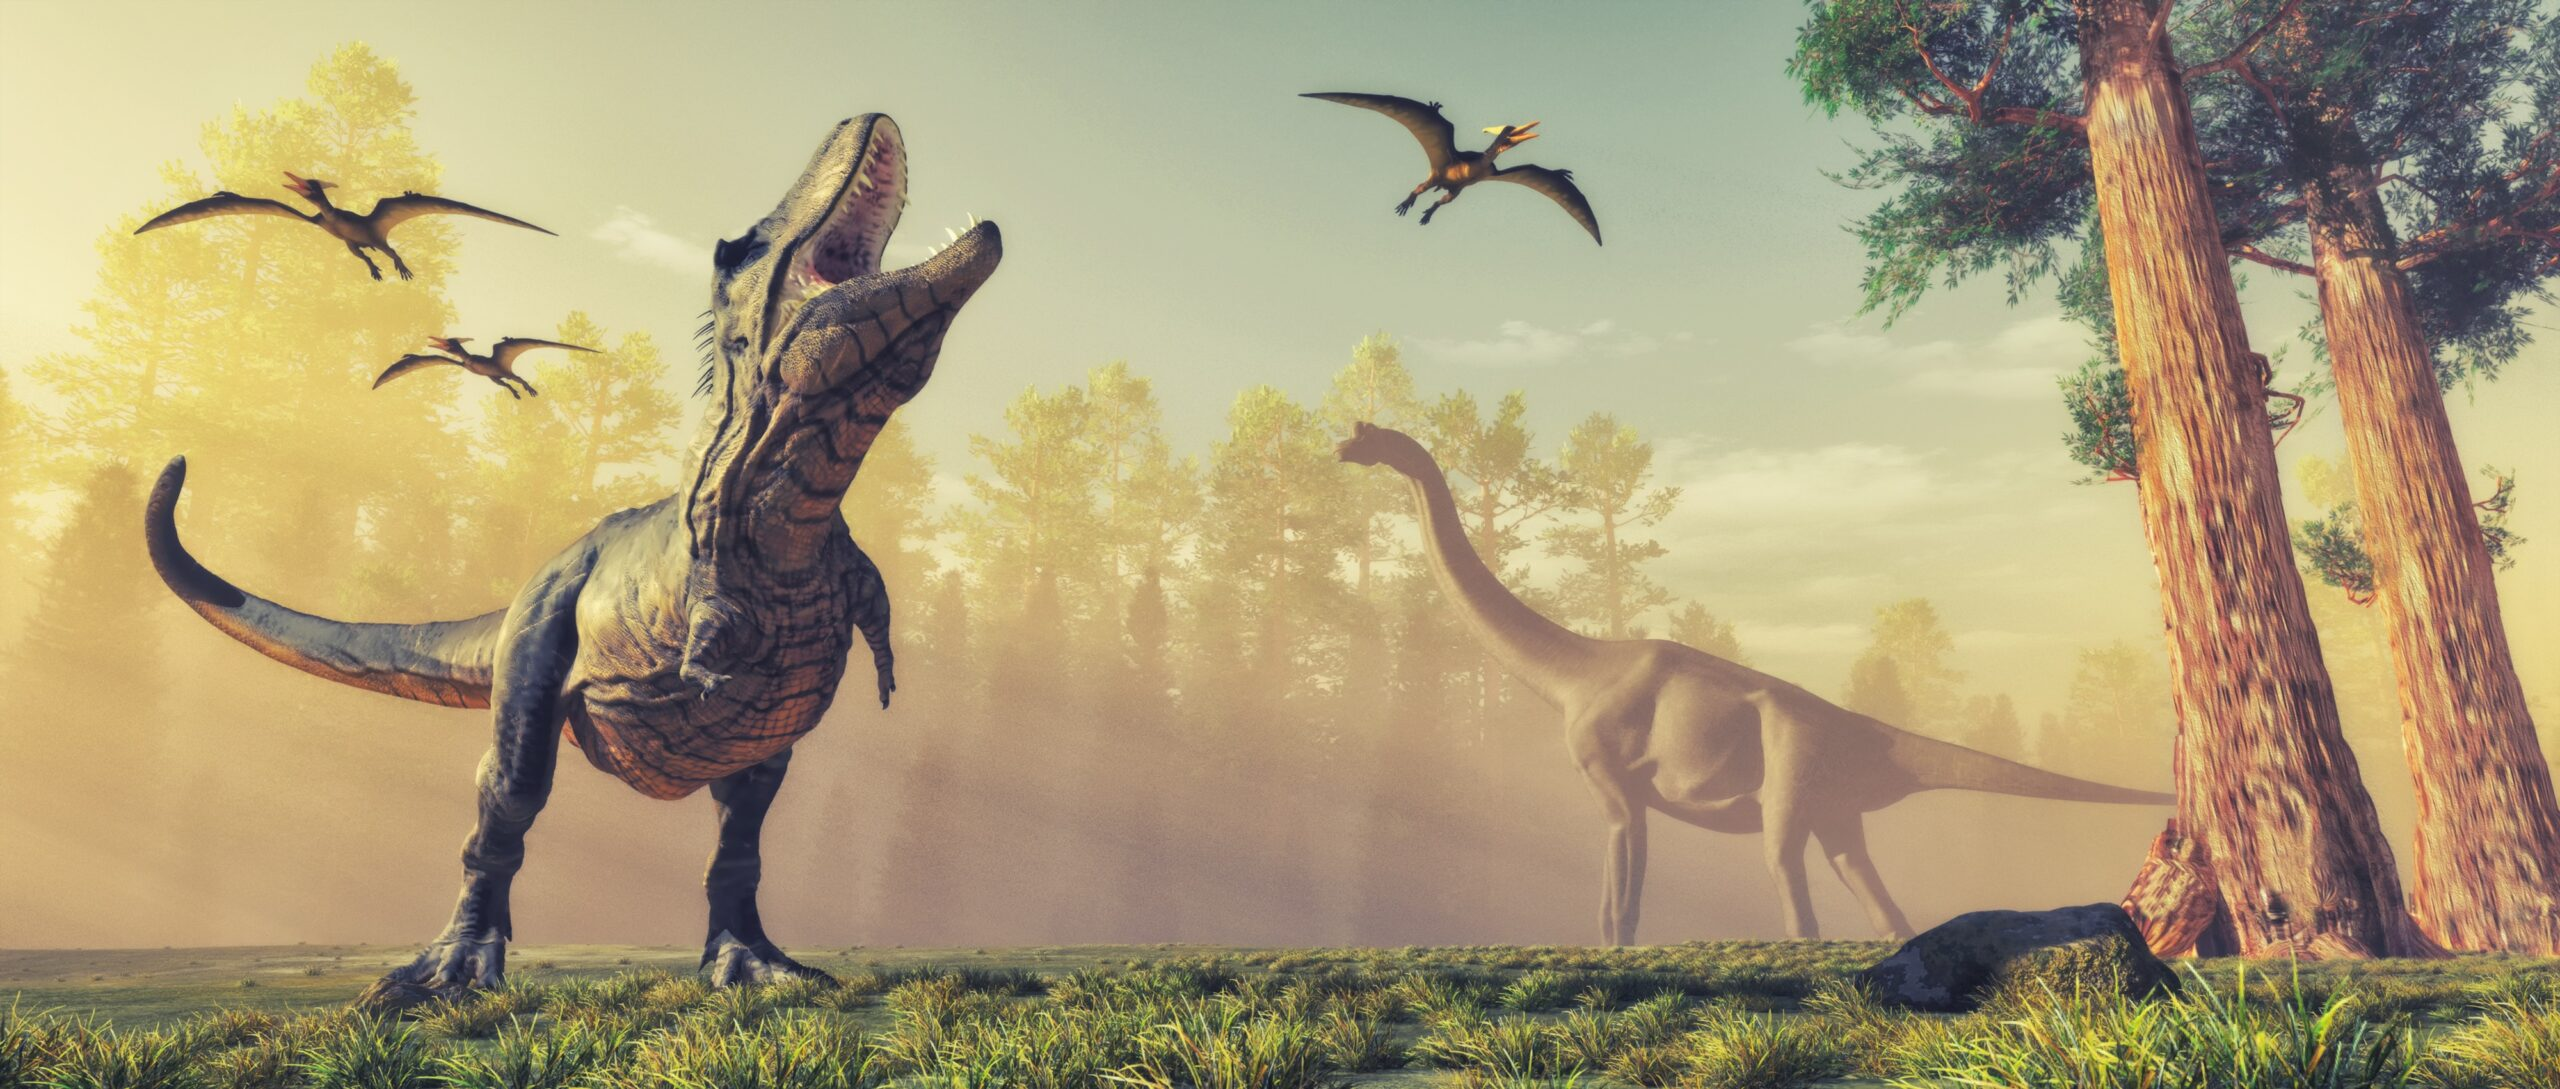 Ron ten Caat's fantasy brings Dino's back